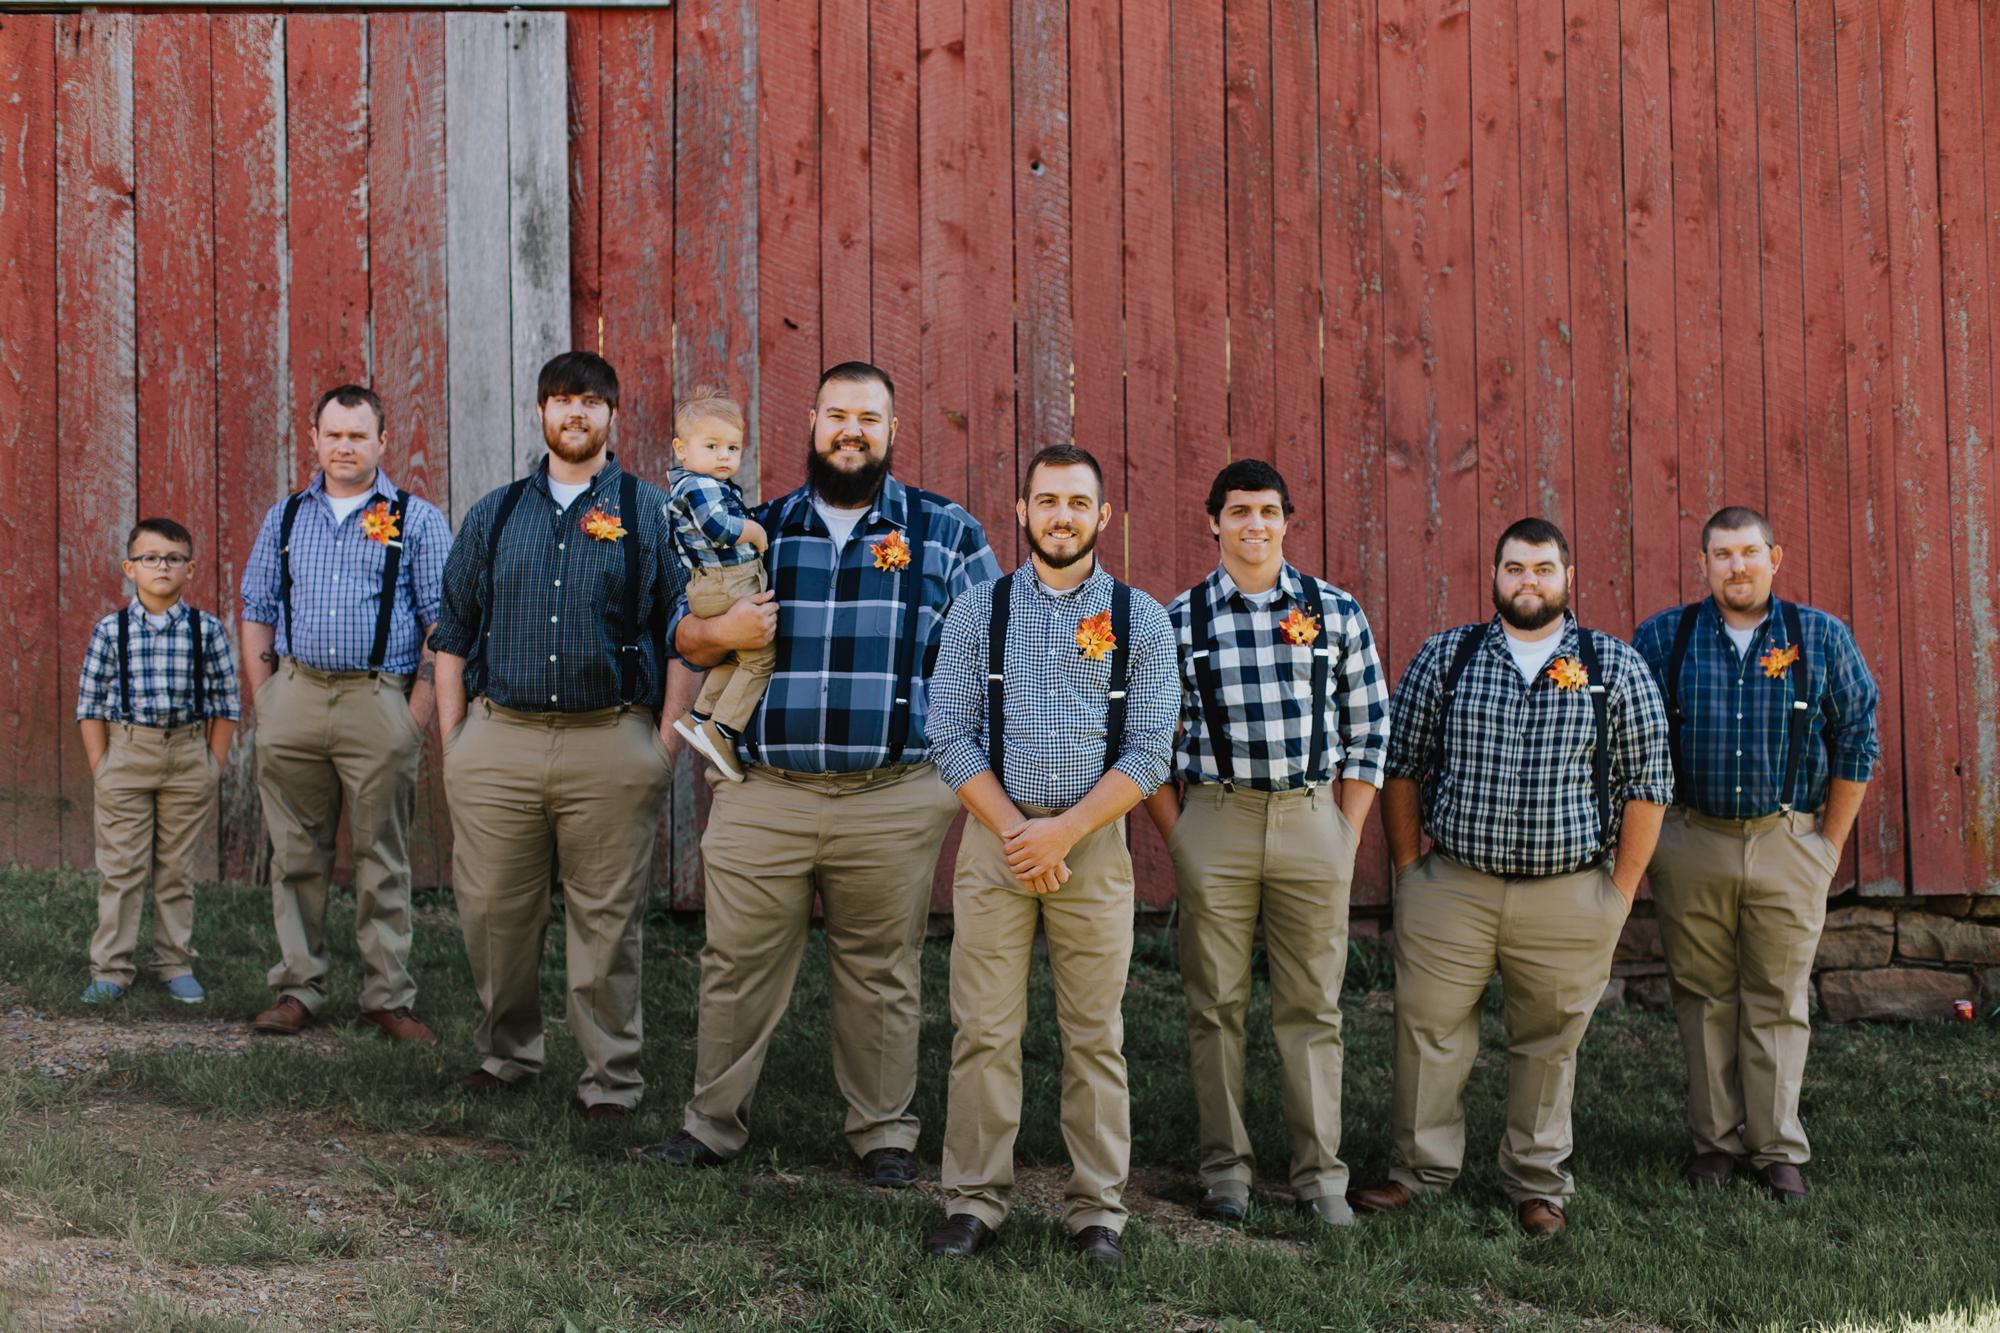 groom-and-grooms-men-barn-photo-wedding-day-photography